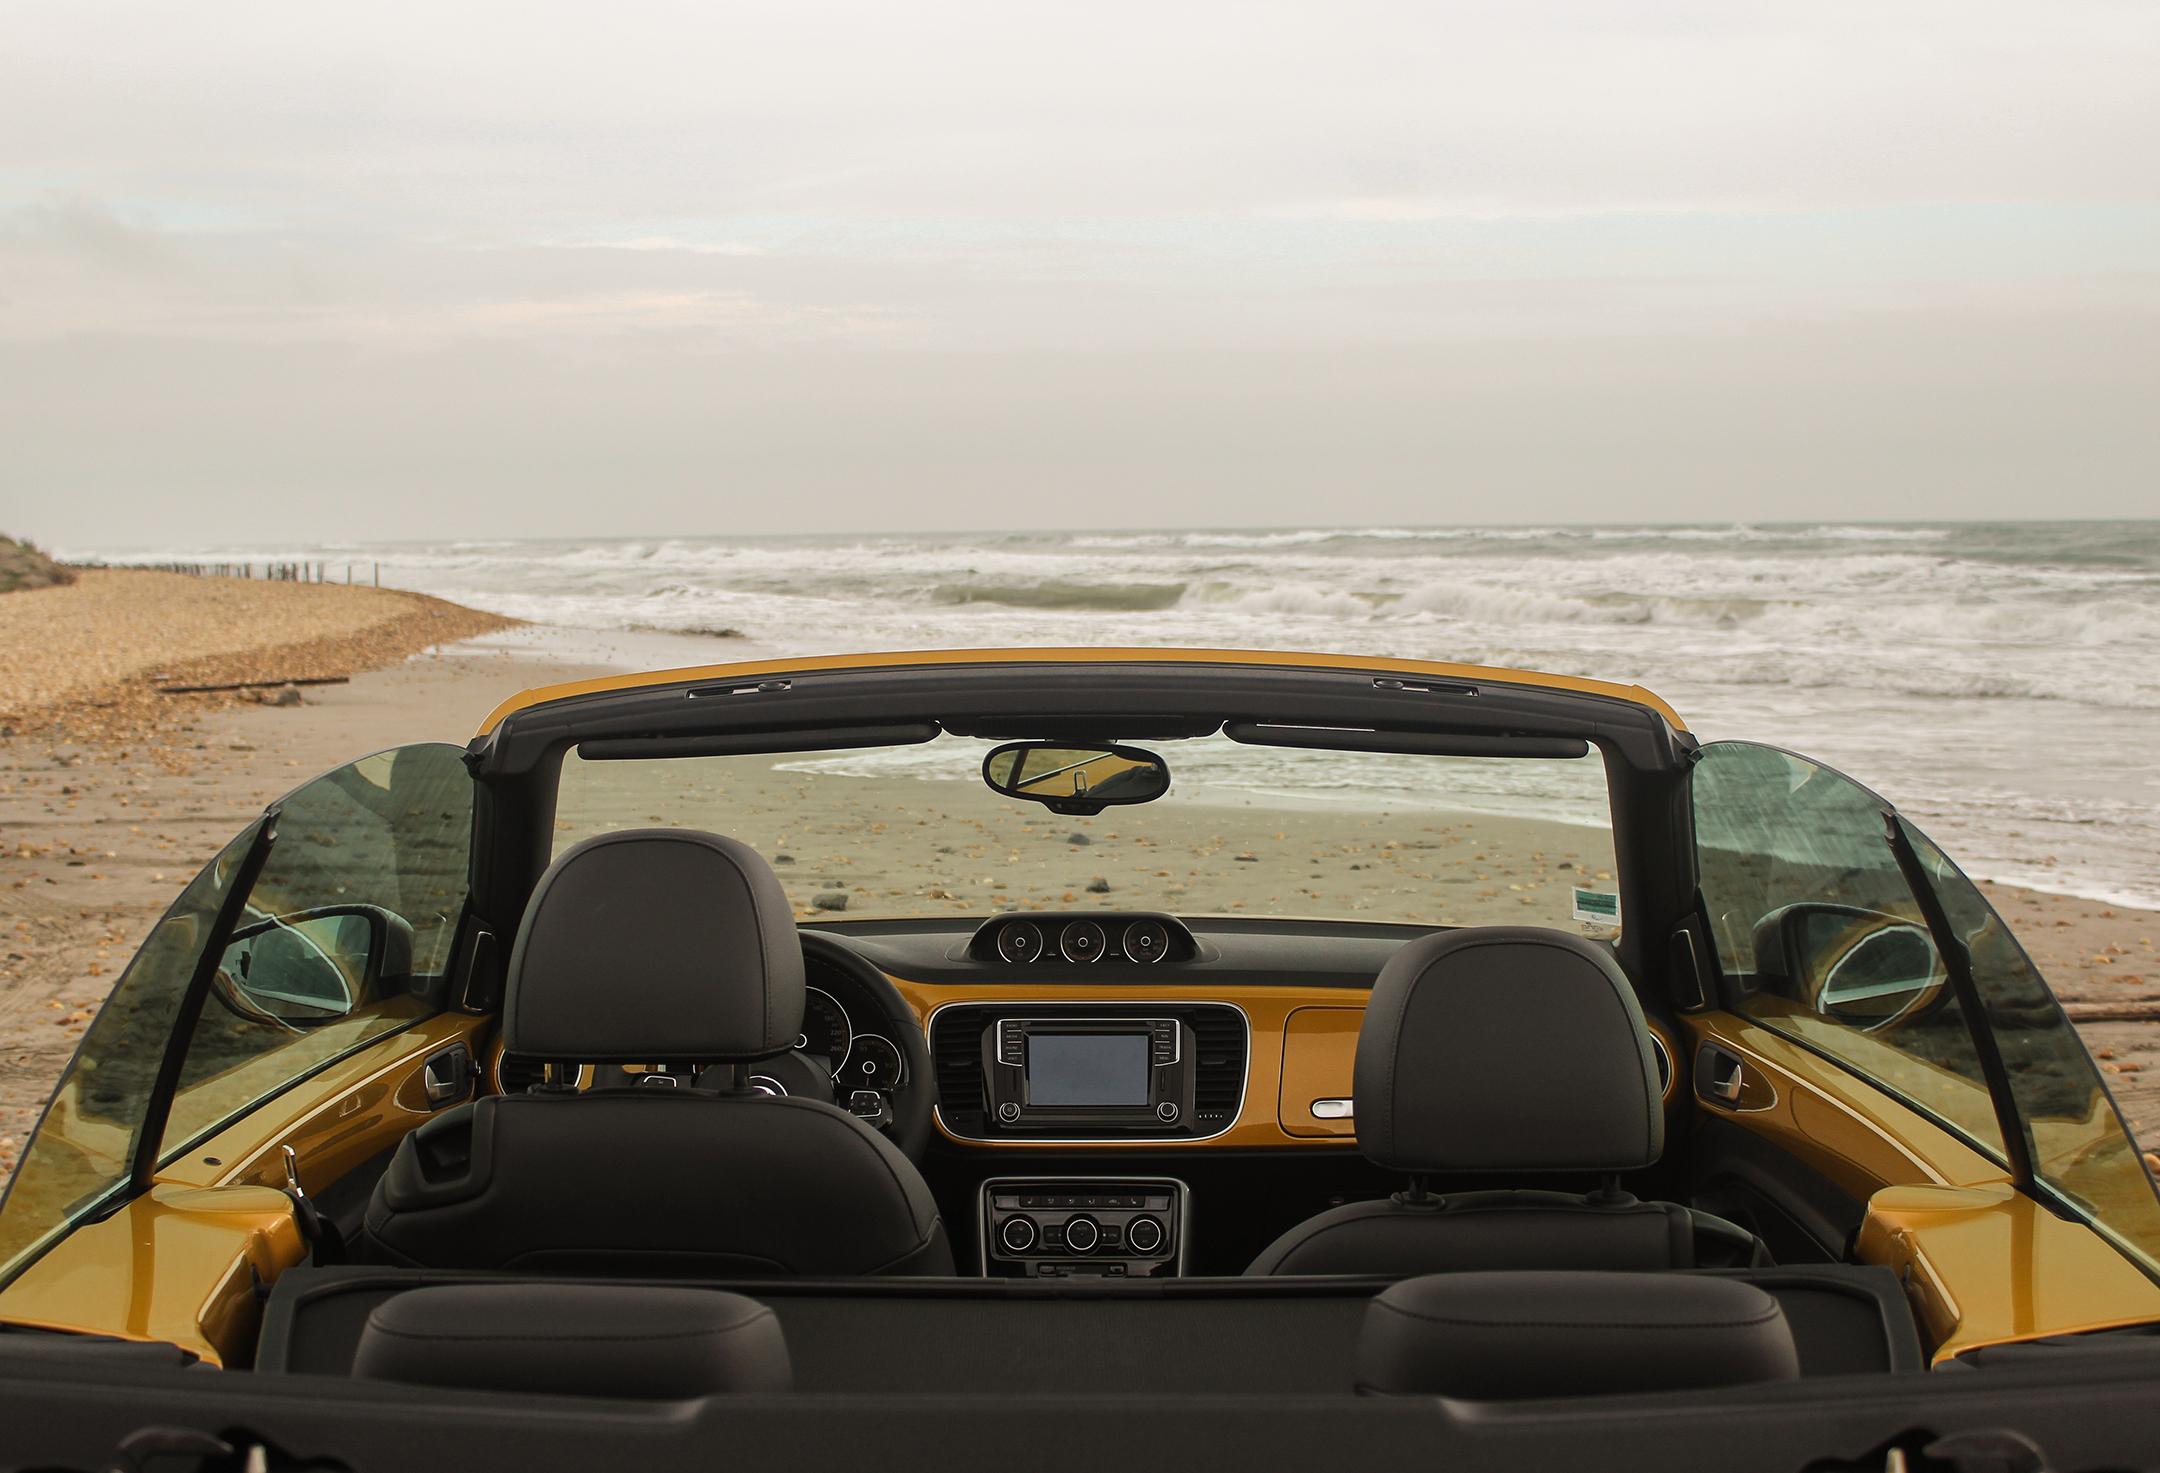 vwcox55-volkswagen-coccinelle-dune-cabriolet-interieur-arnaud-demasier-rsphotographie